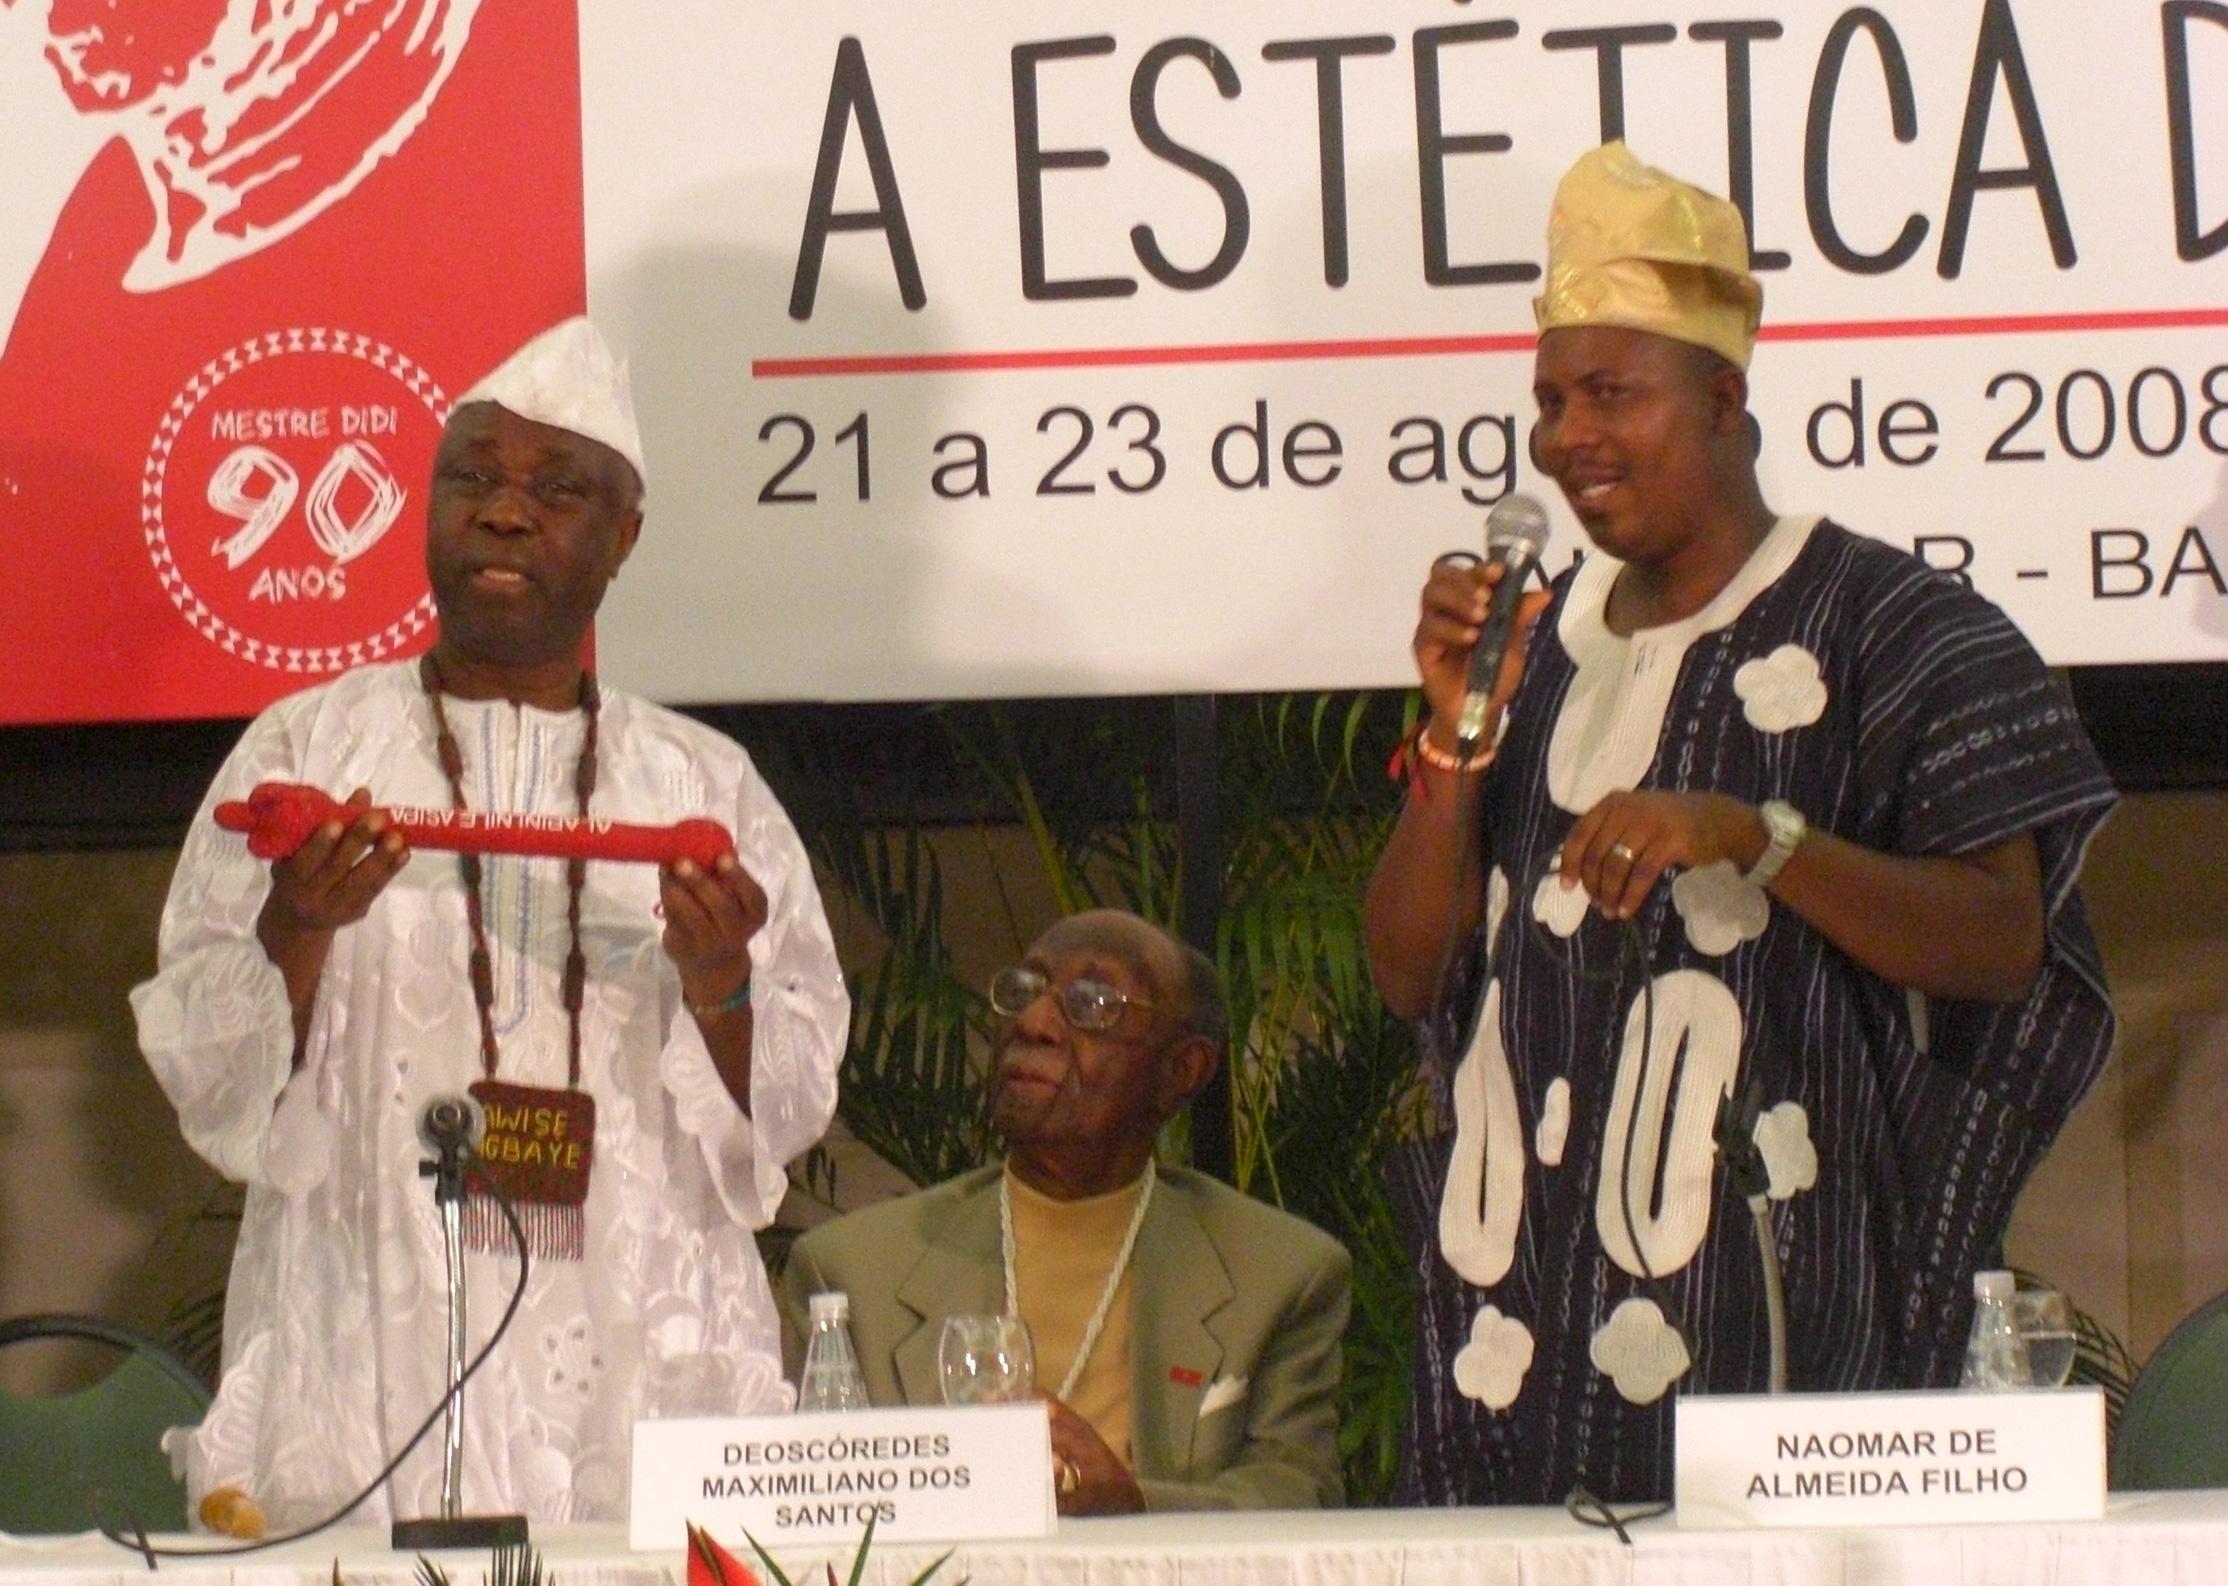 Felix Ayoh Omidire with Awise Wande Abimbola and Mestre Didi Alapinni of Ile Asipa l, Salavador da Bahia.©Félix Ayoh'OMIDIRE